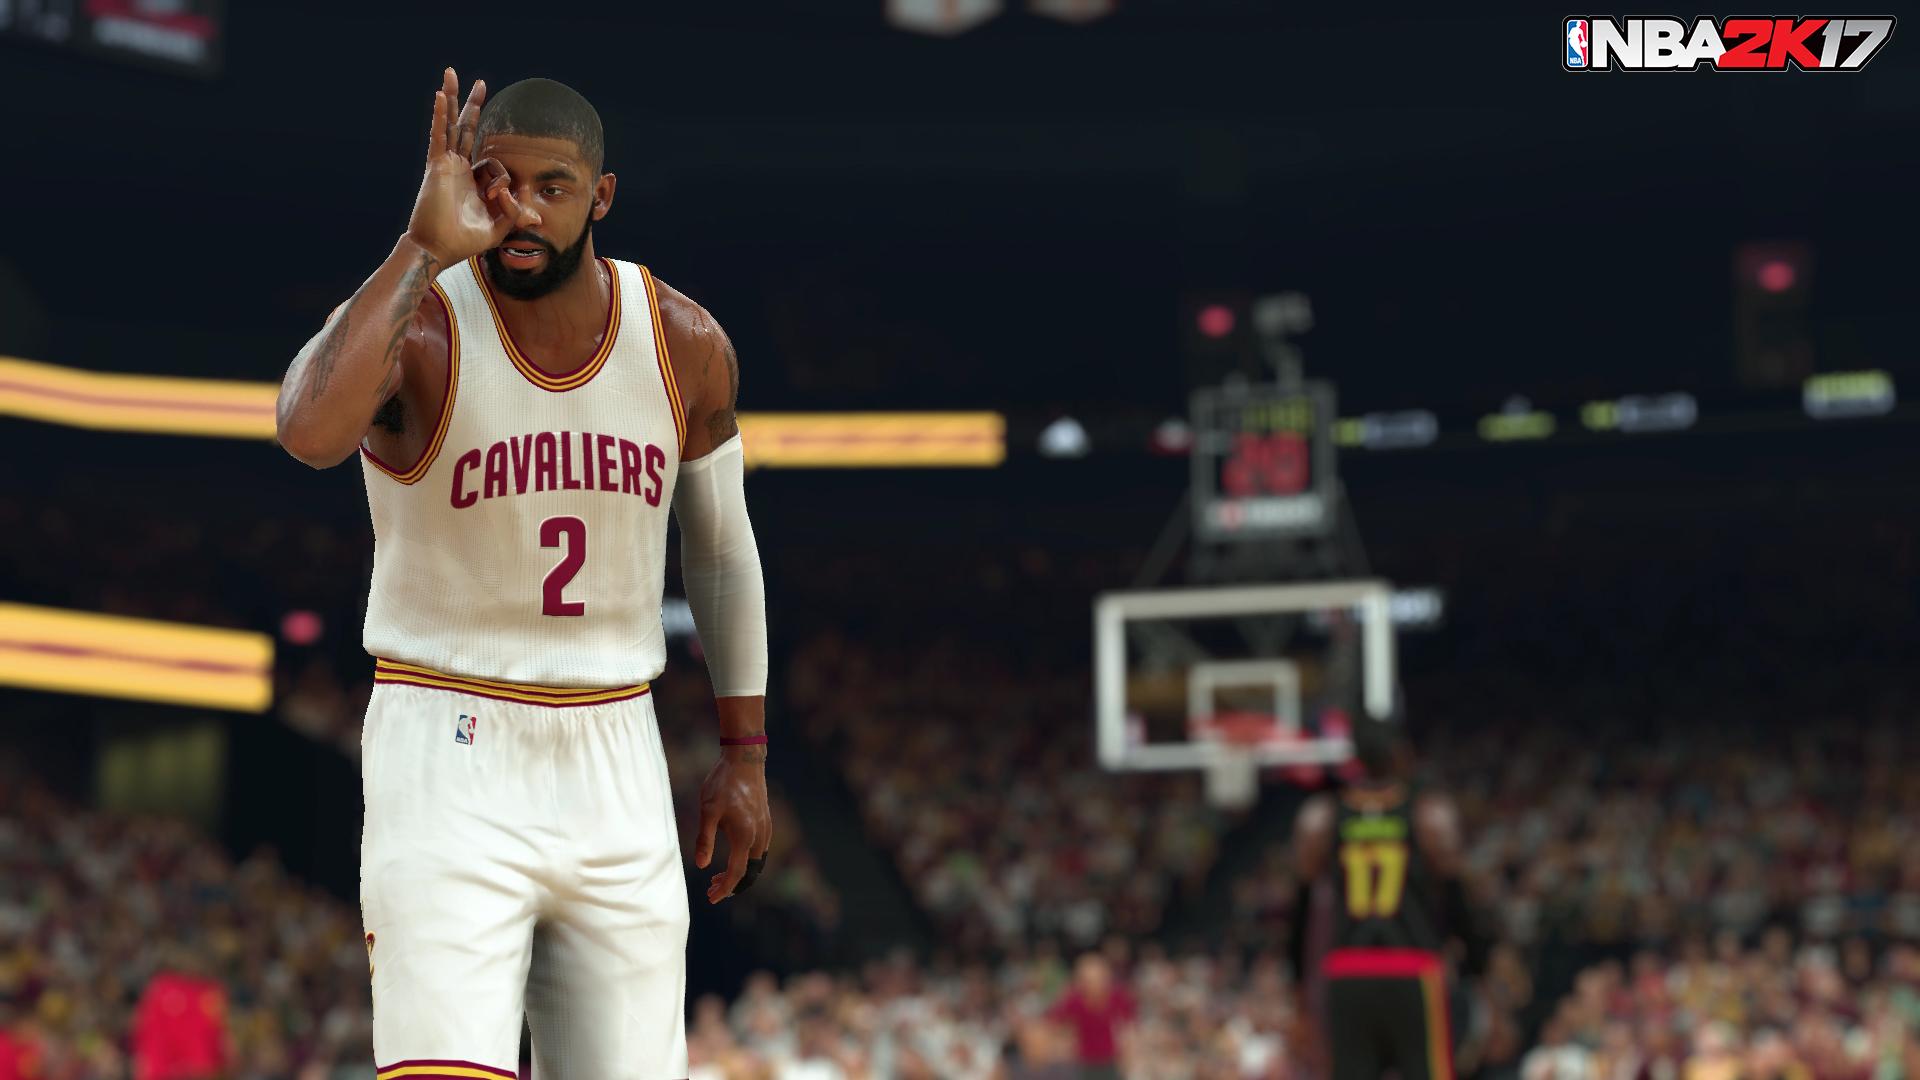 《NBA 2K17》NBA球迷的狂欢节10